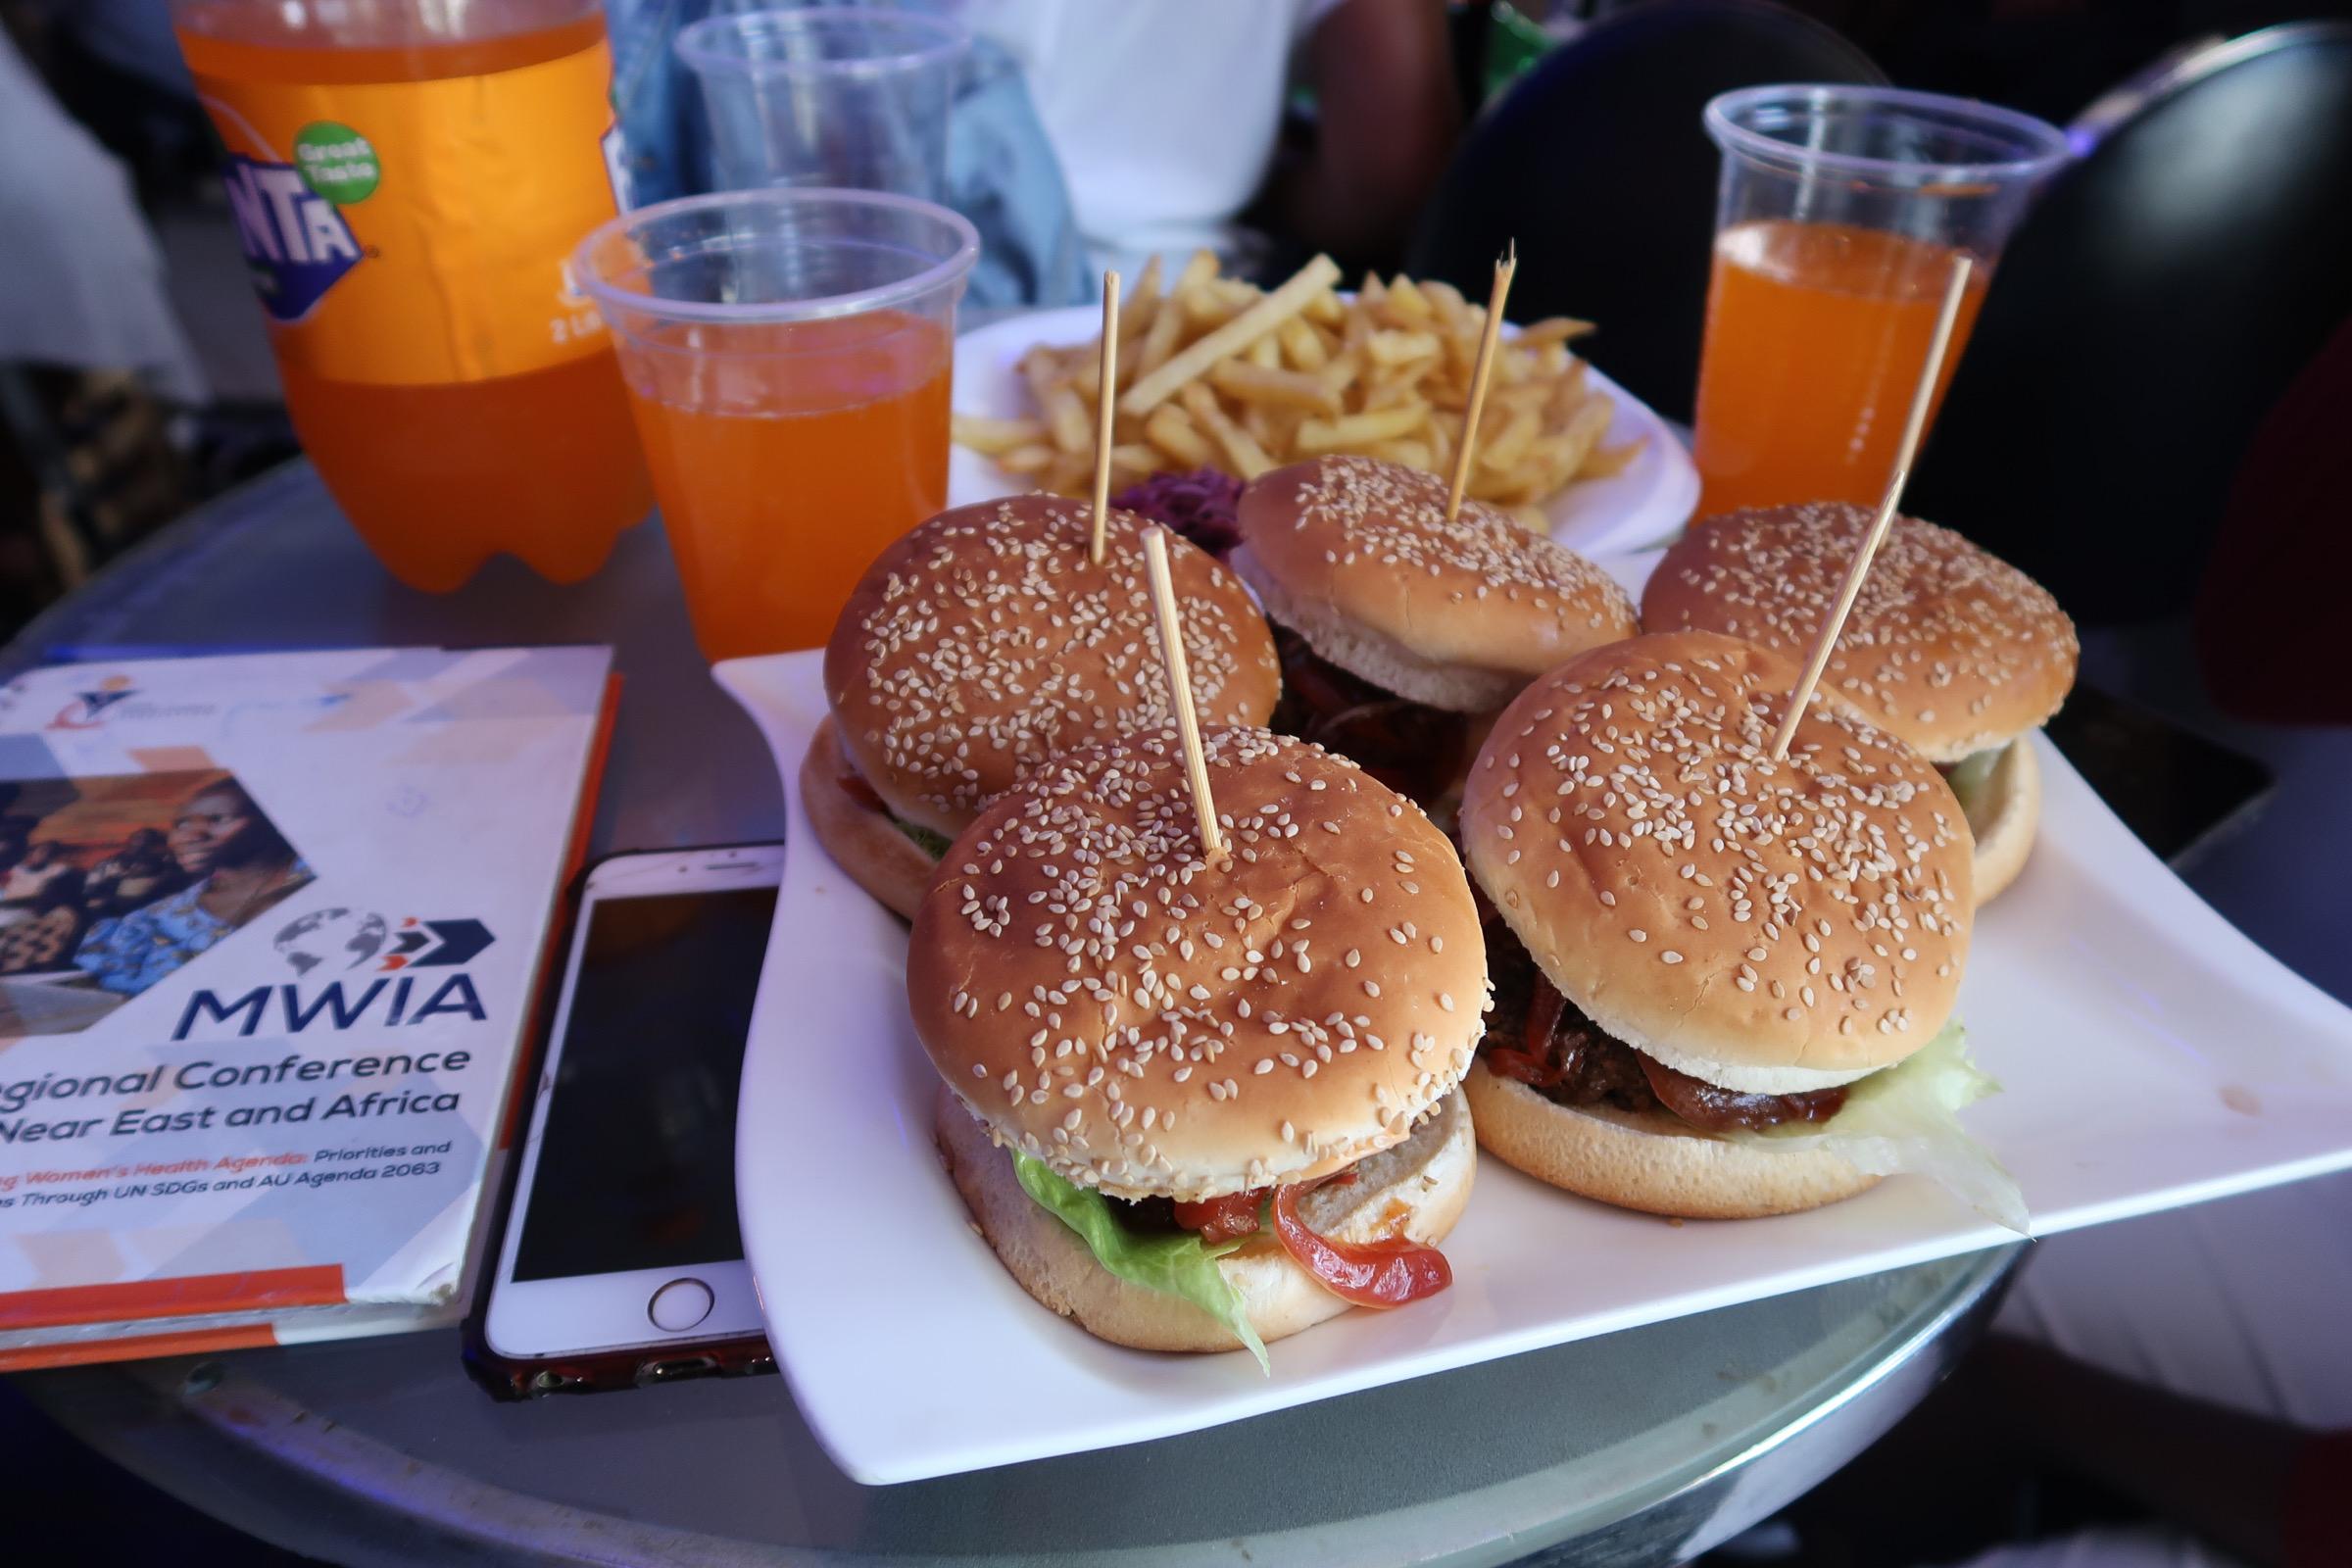 THINGS TO DO AT SANTORINI LOUNGE GRILL-KIKUYU